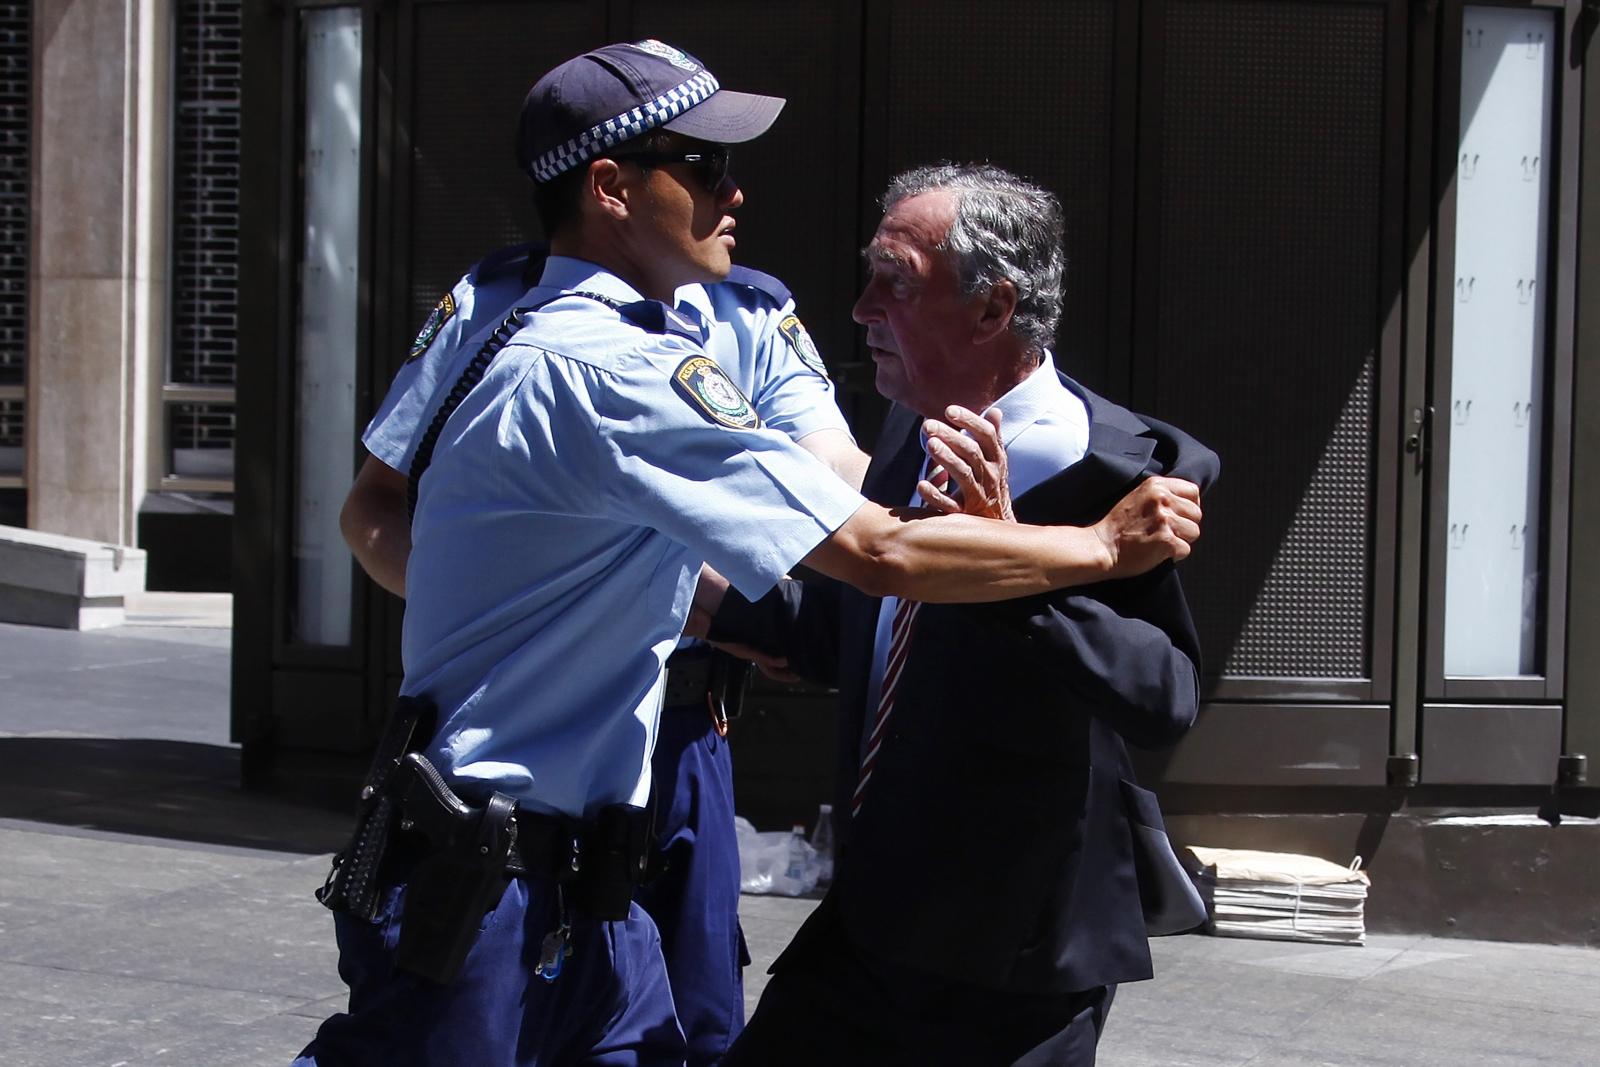 Martin Place Sydney seige hostage situation